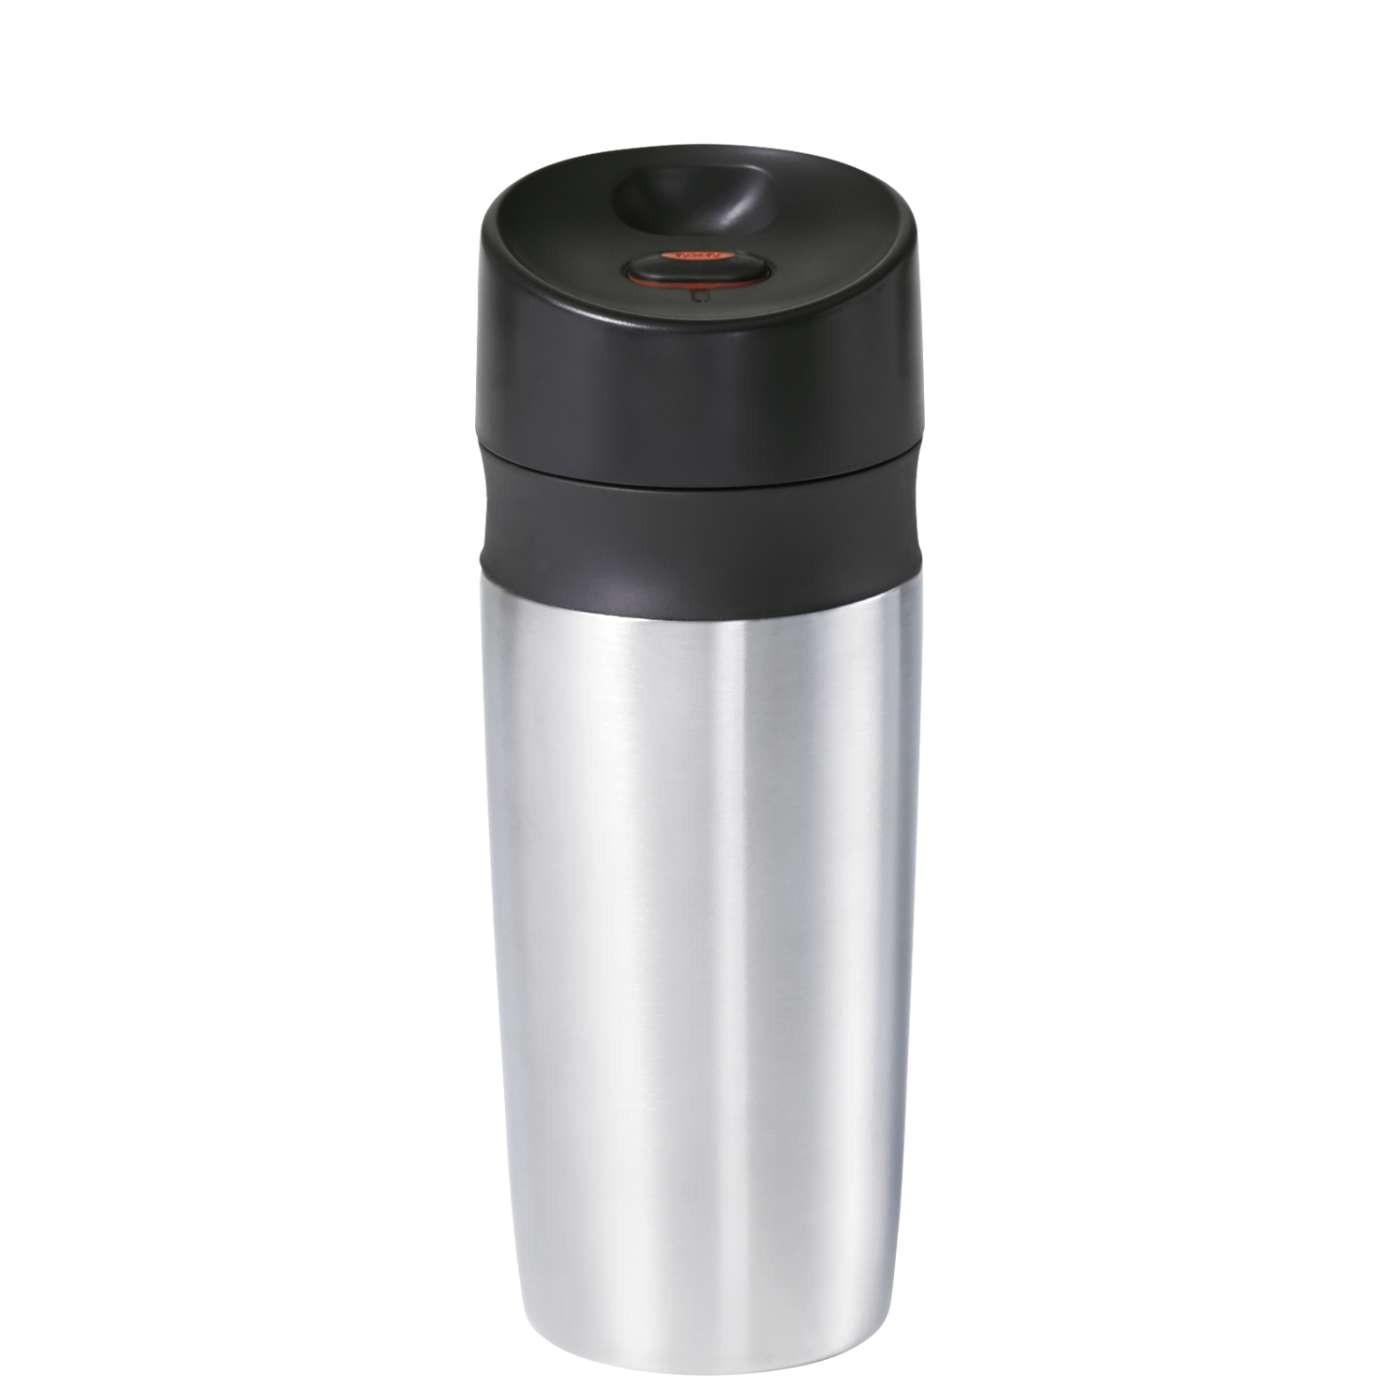 Oxo Stainless Steel Liquiseal Travel Mug 18 Oz Oxo Stainless Steel Travel Mug 18oz Alternative Brewing